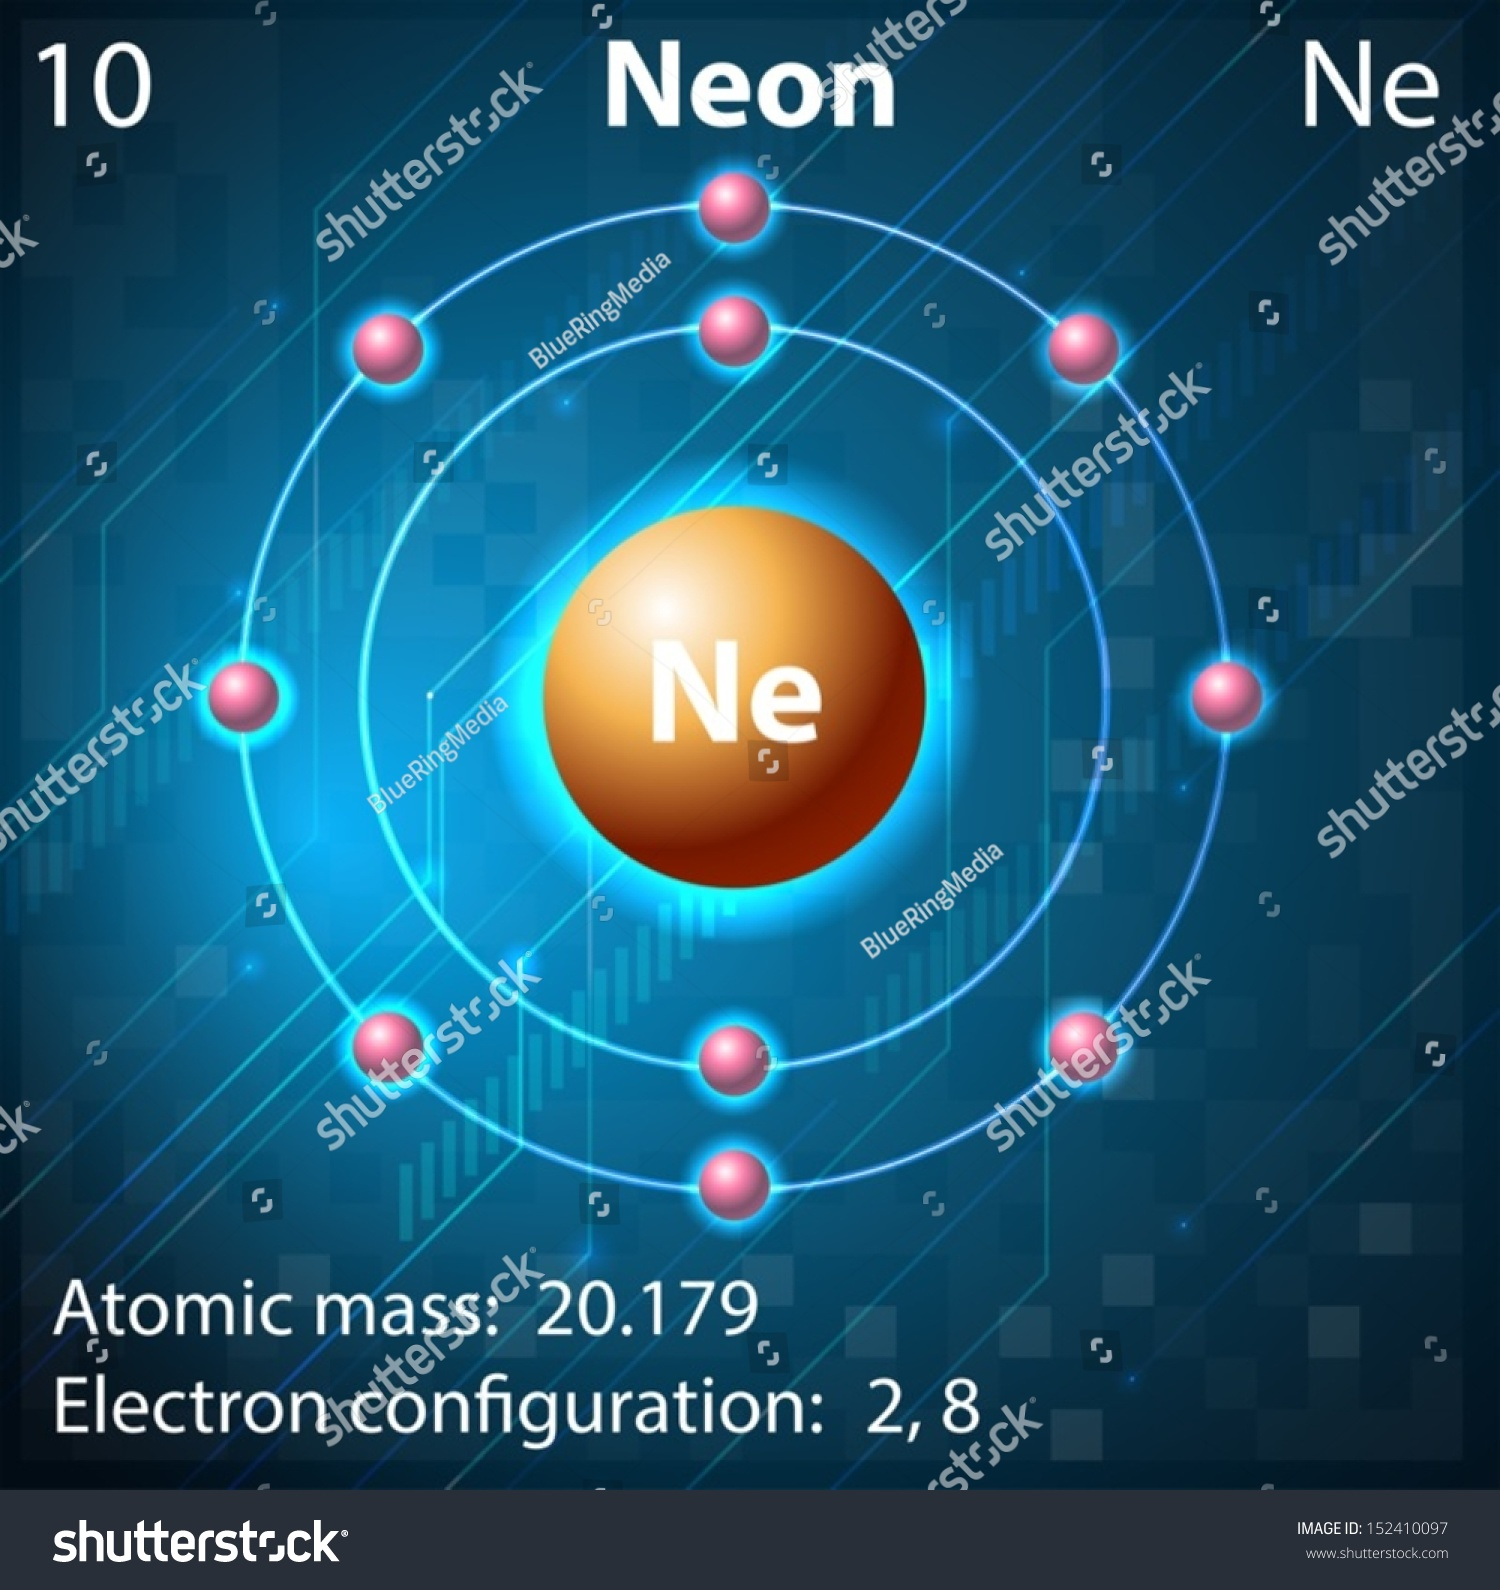 Illustration Element Neon Stock Vector 152410097 - Shutterstock